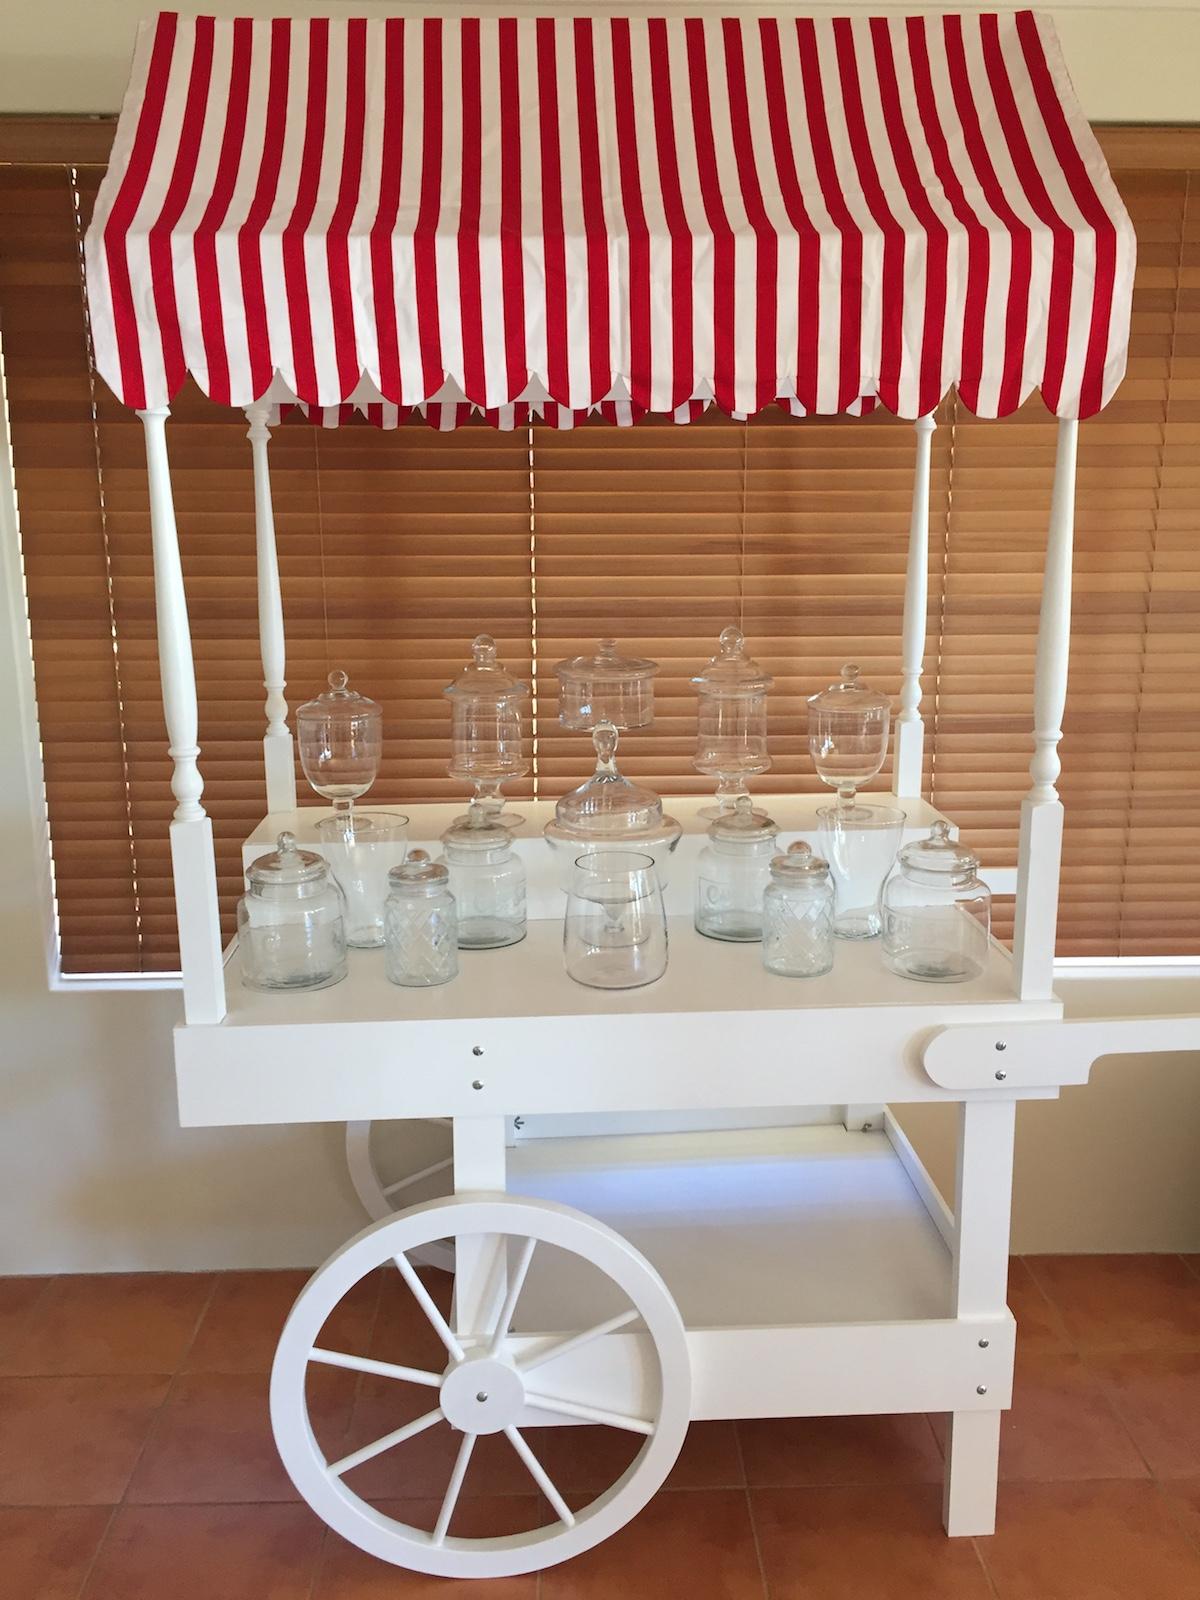 Cart-Only-Hire-Little-Lolly-Cart-15-Jars.JPG